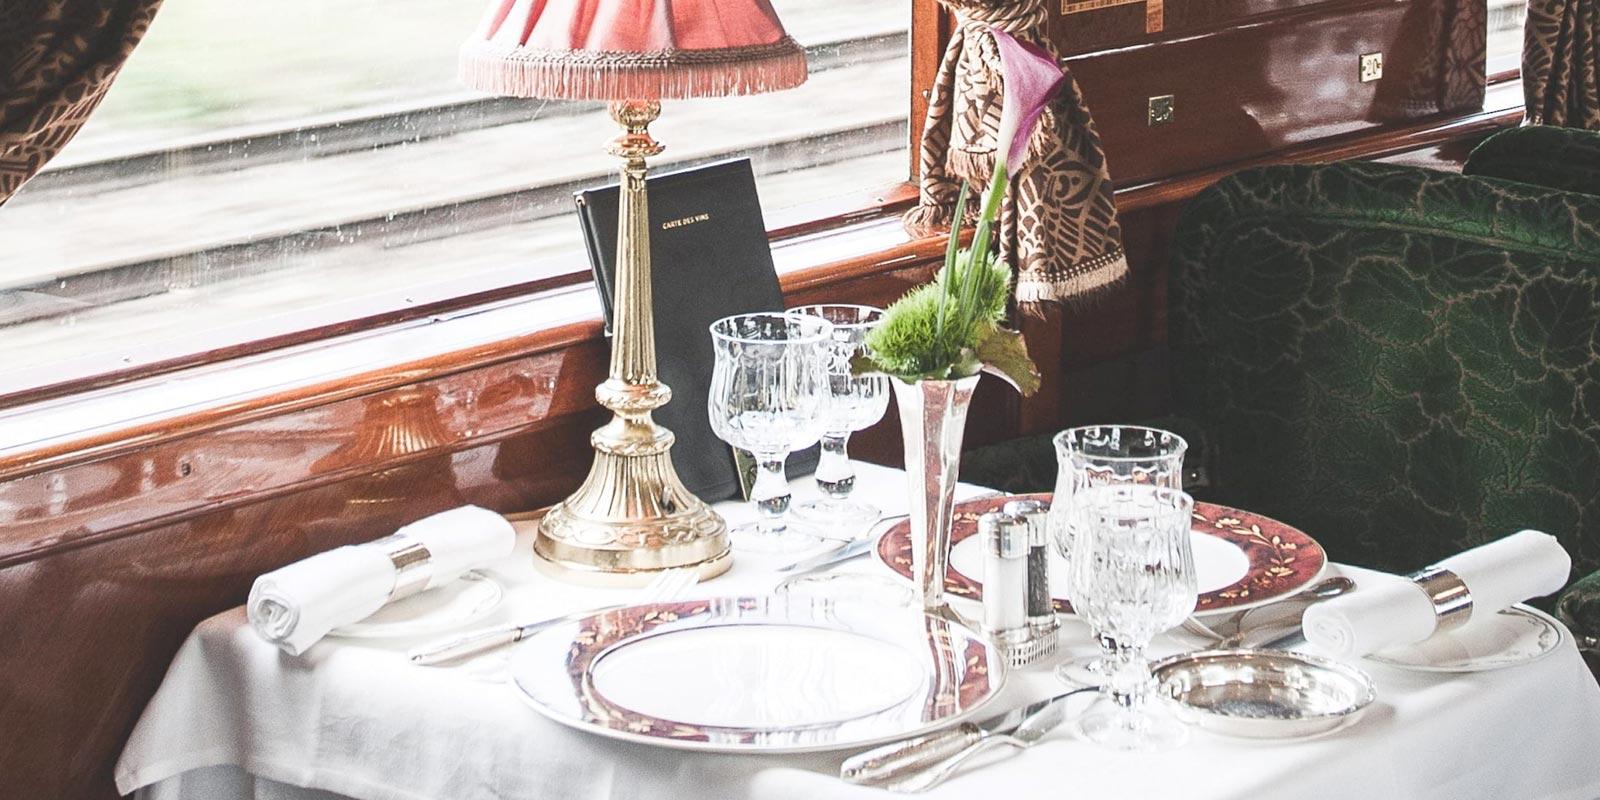 Dining aboard the Belmond Venice Simplon-Orient-Express